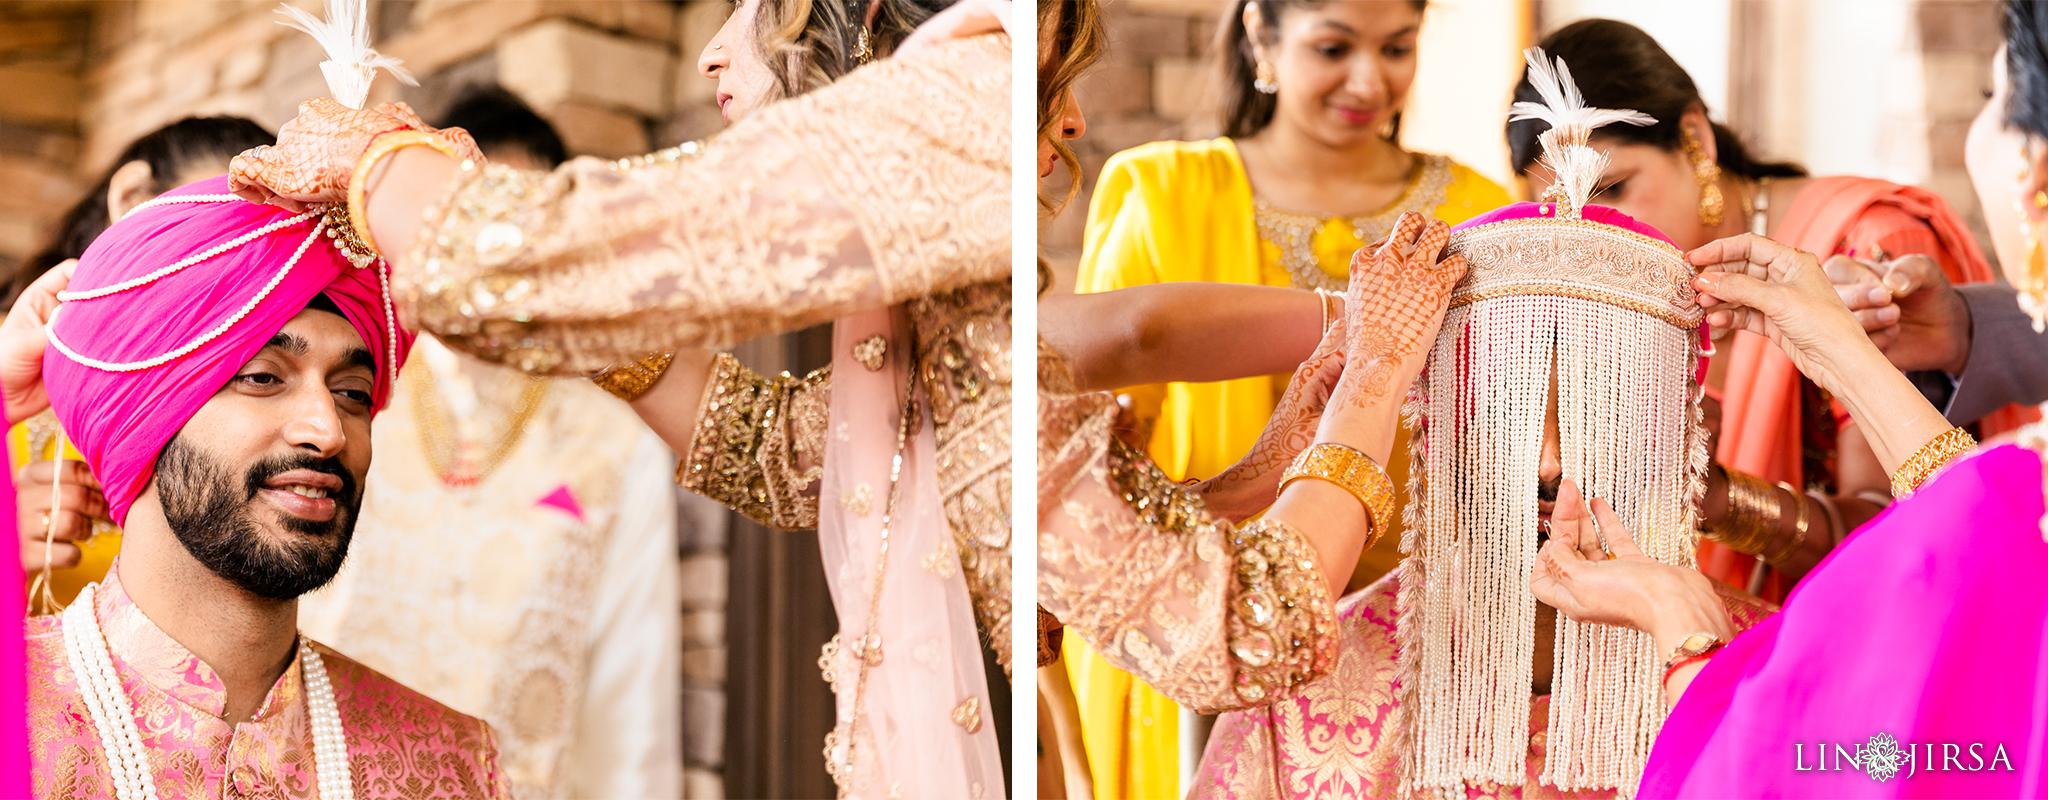 07 Coronado Resort and Spa San Diego Punjabi Wedding Photography